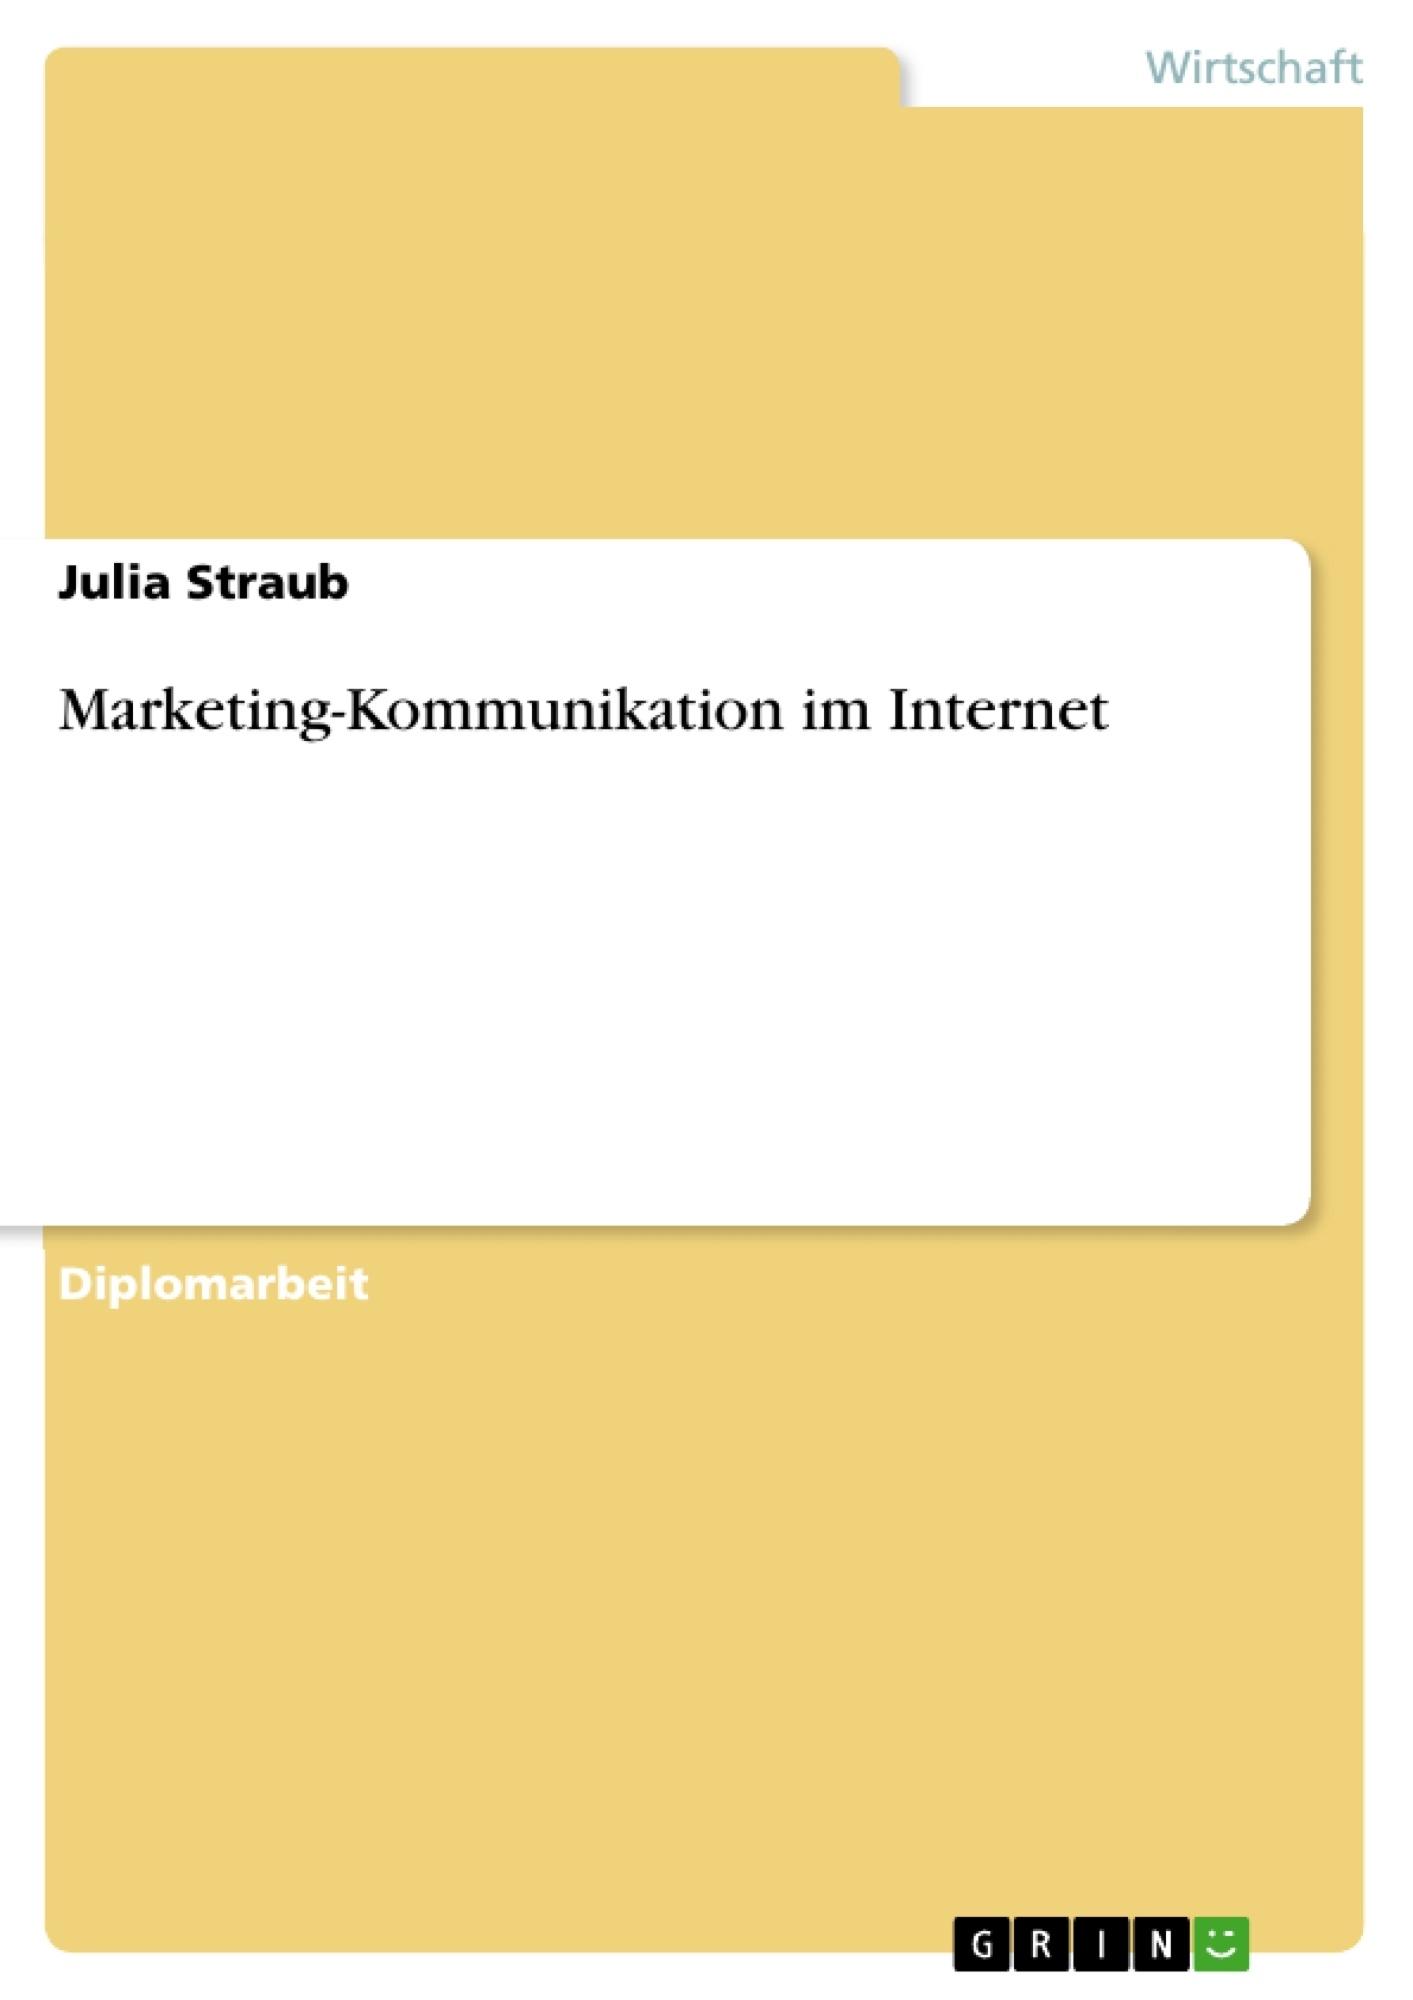 Titel: Marketing-Kommunikation im Internet